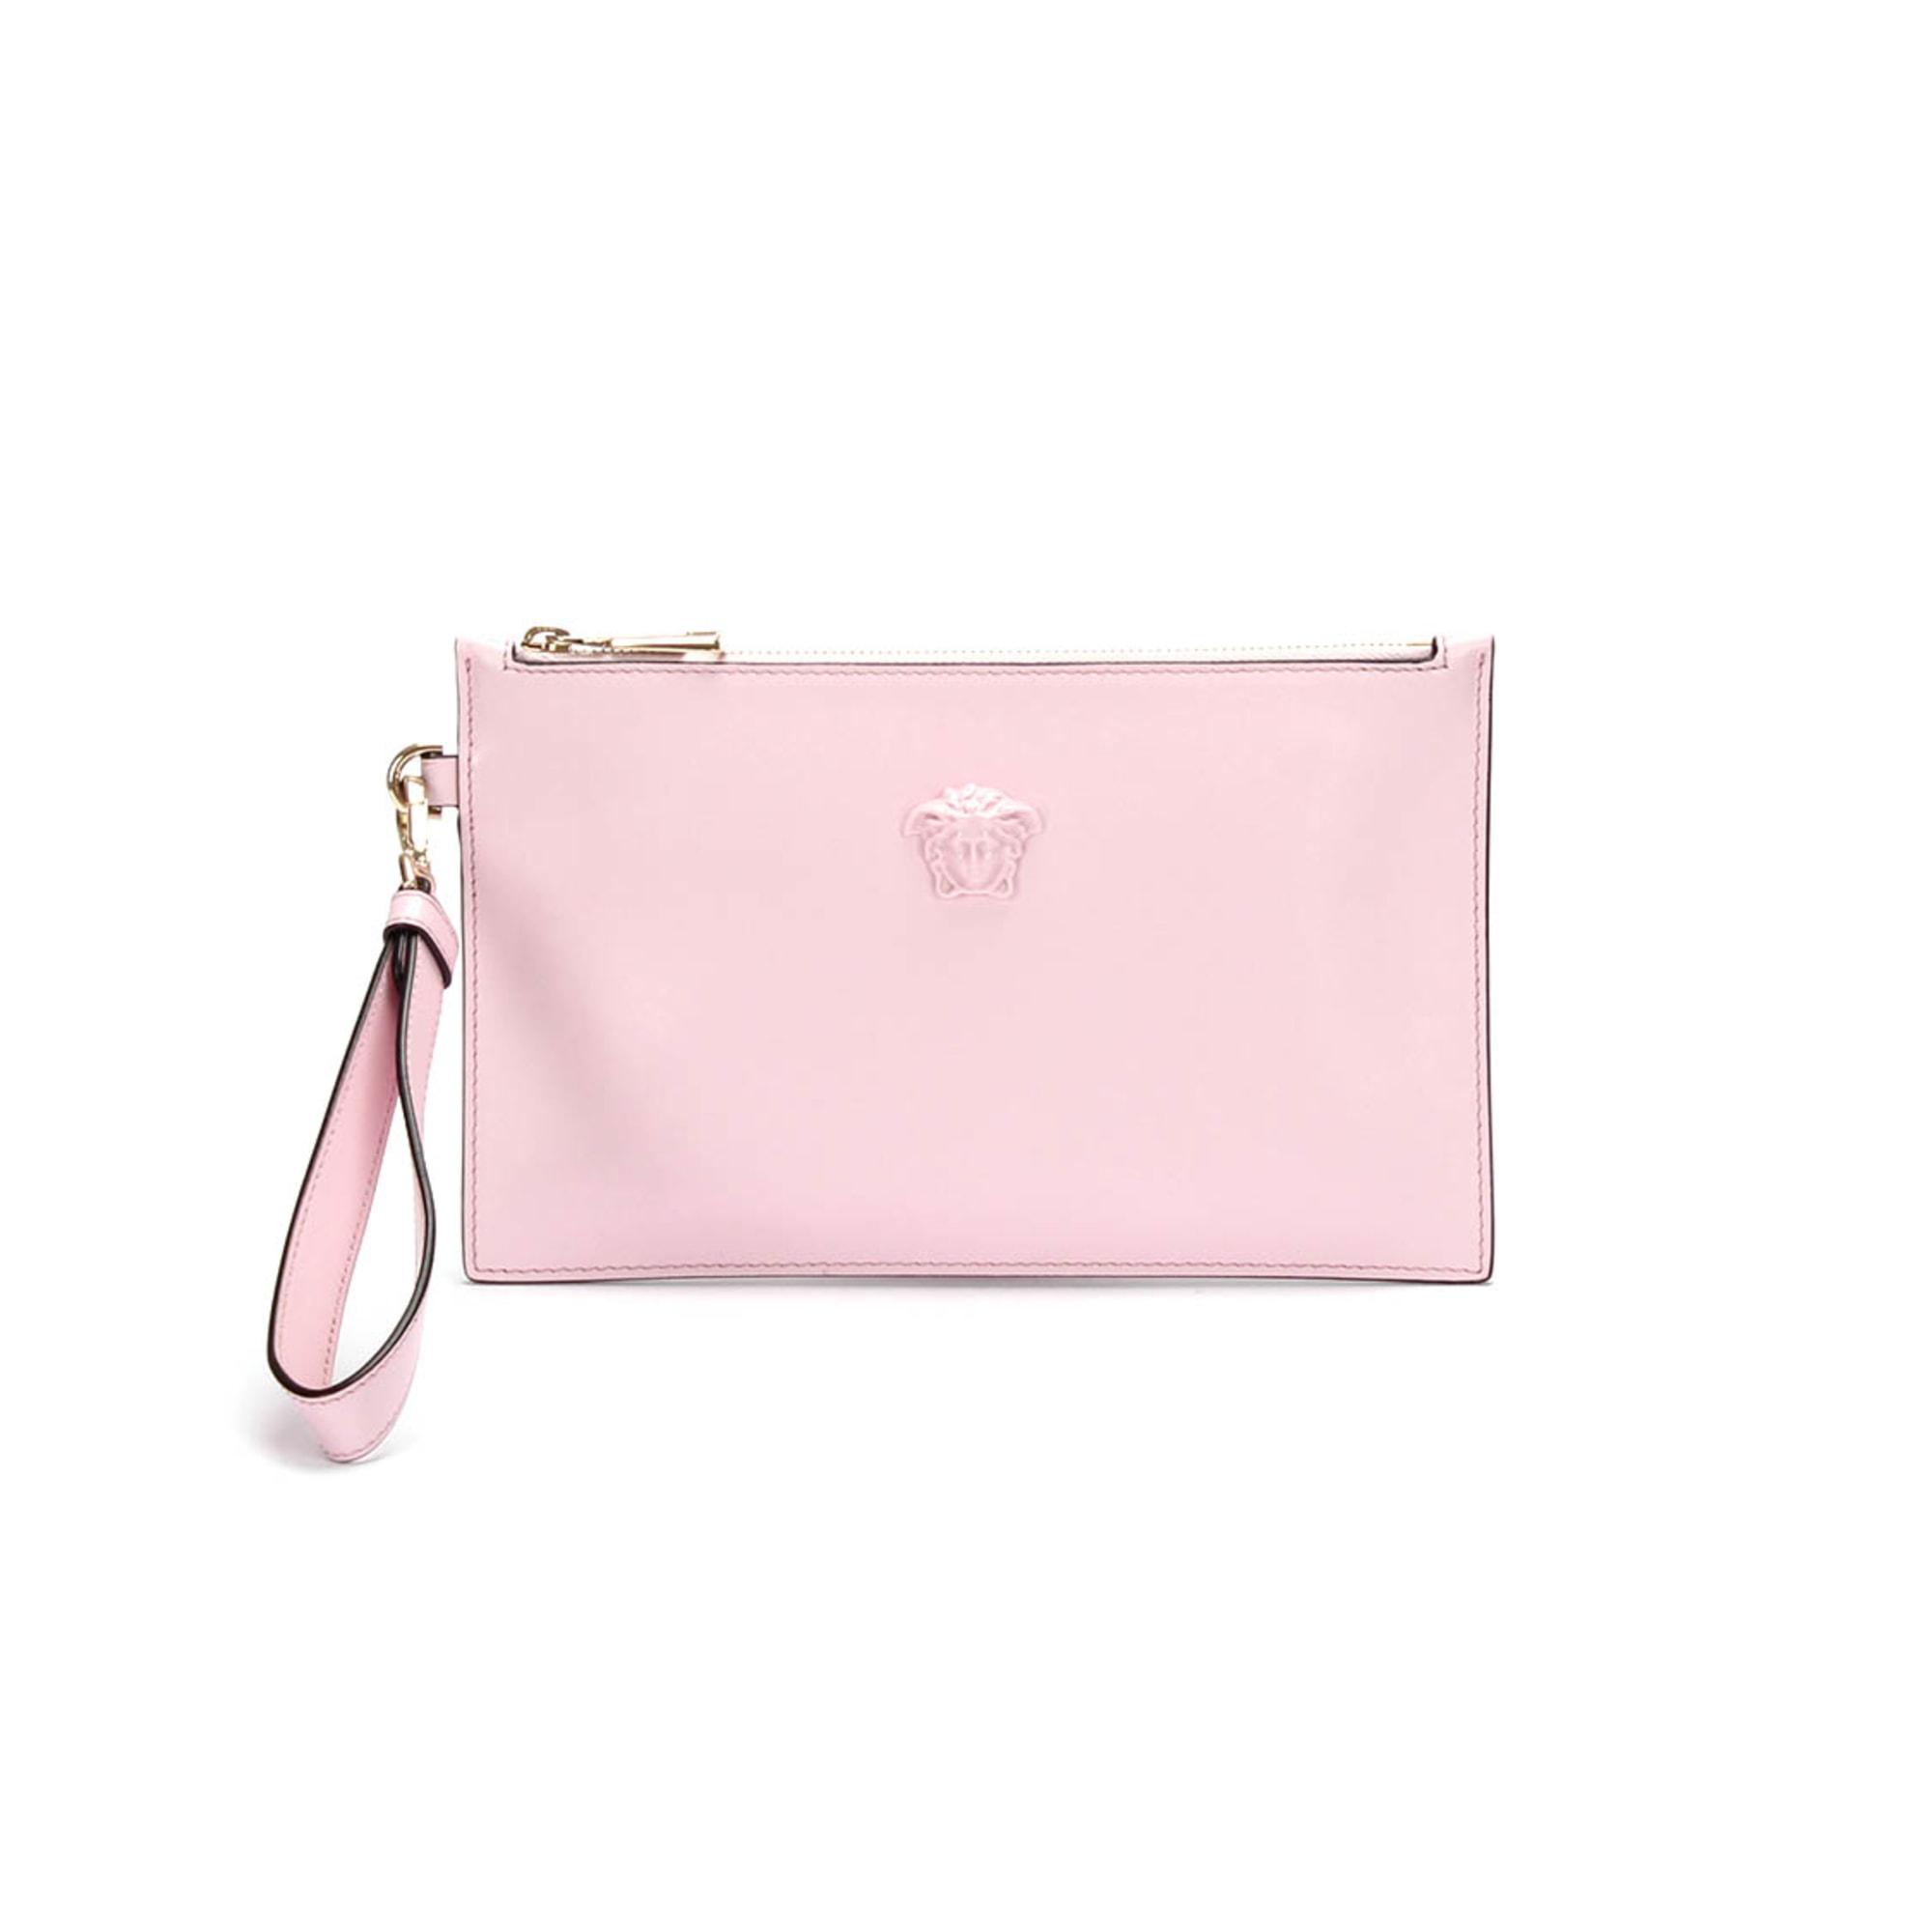 Handtasche Stoff VERSACE Pink,  altrosa